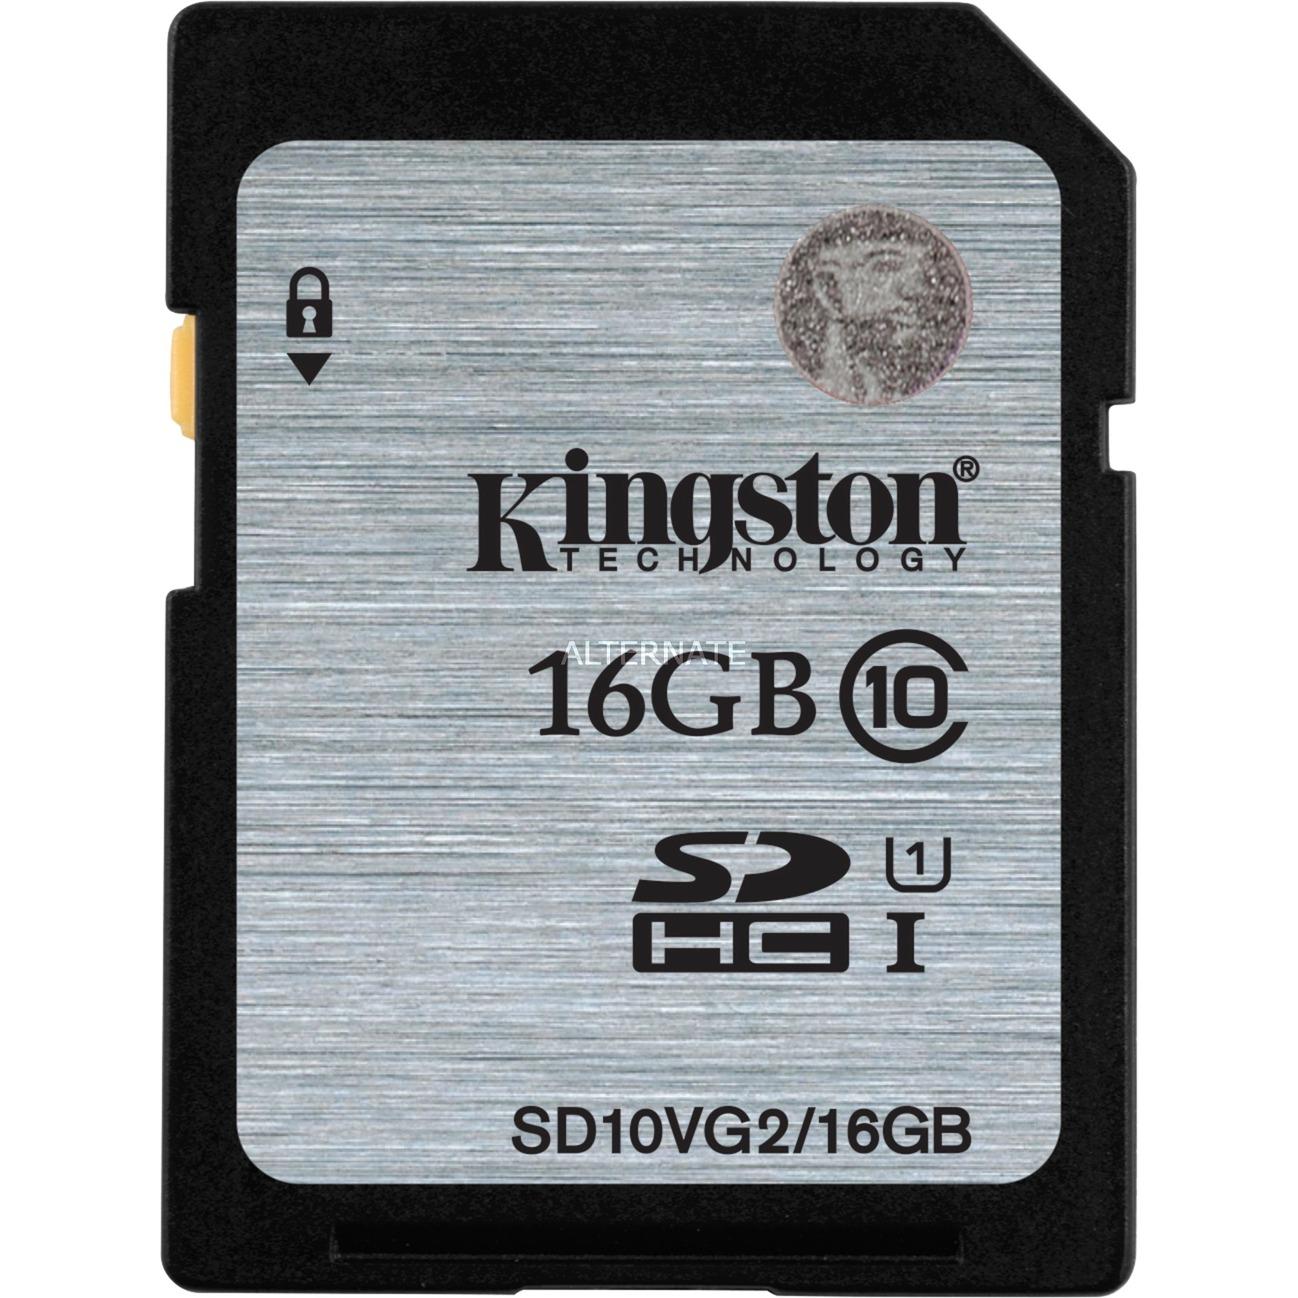 class-10-uhs-i-sdhc-16gb-16gb-sdhc-uhs-klasse-10-flash-hukommelse-hukommelseskort